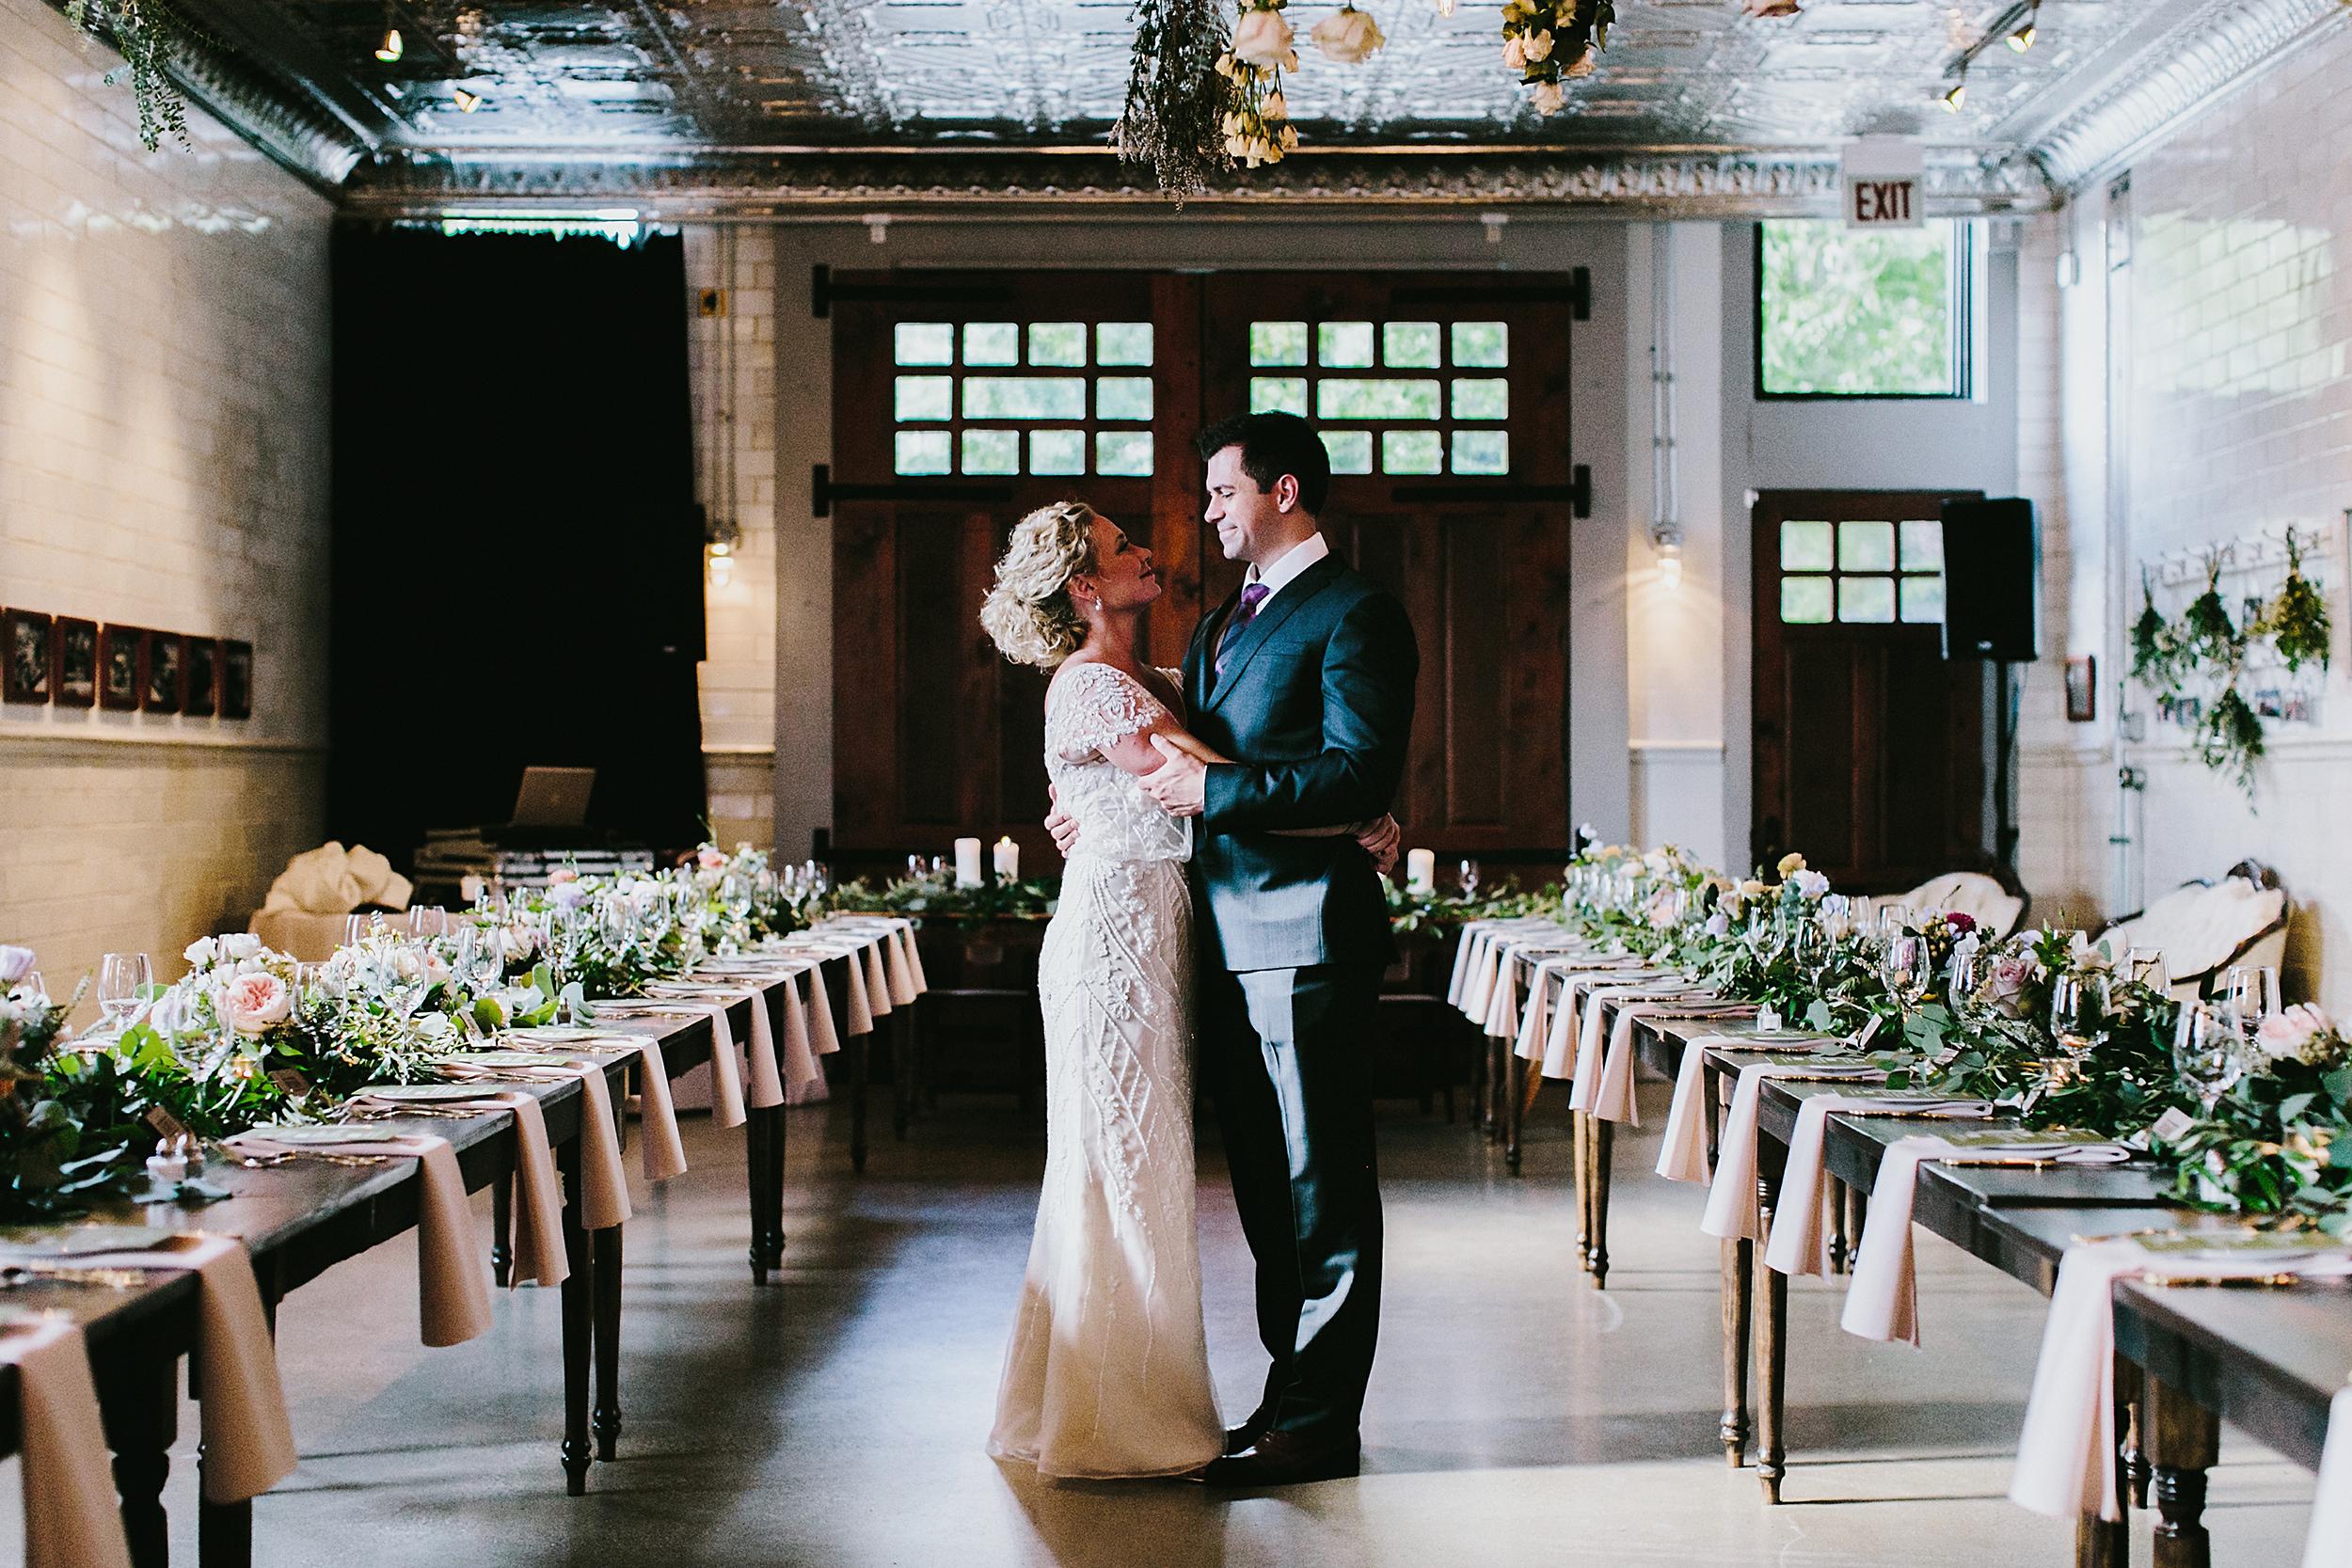 bride and groom in Asrai Garden wedding arrangements in Firehouse Chicago, Illinois